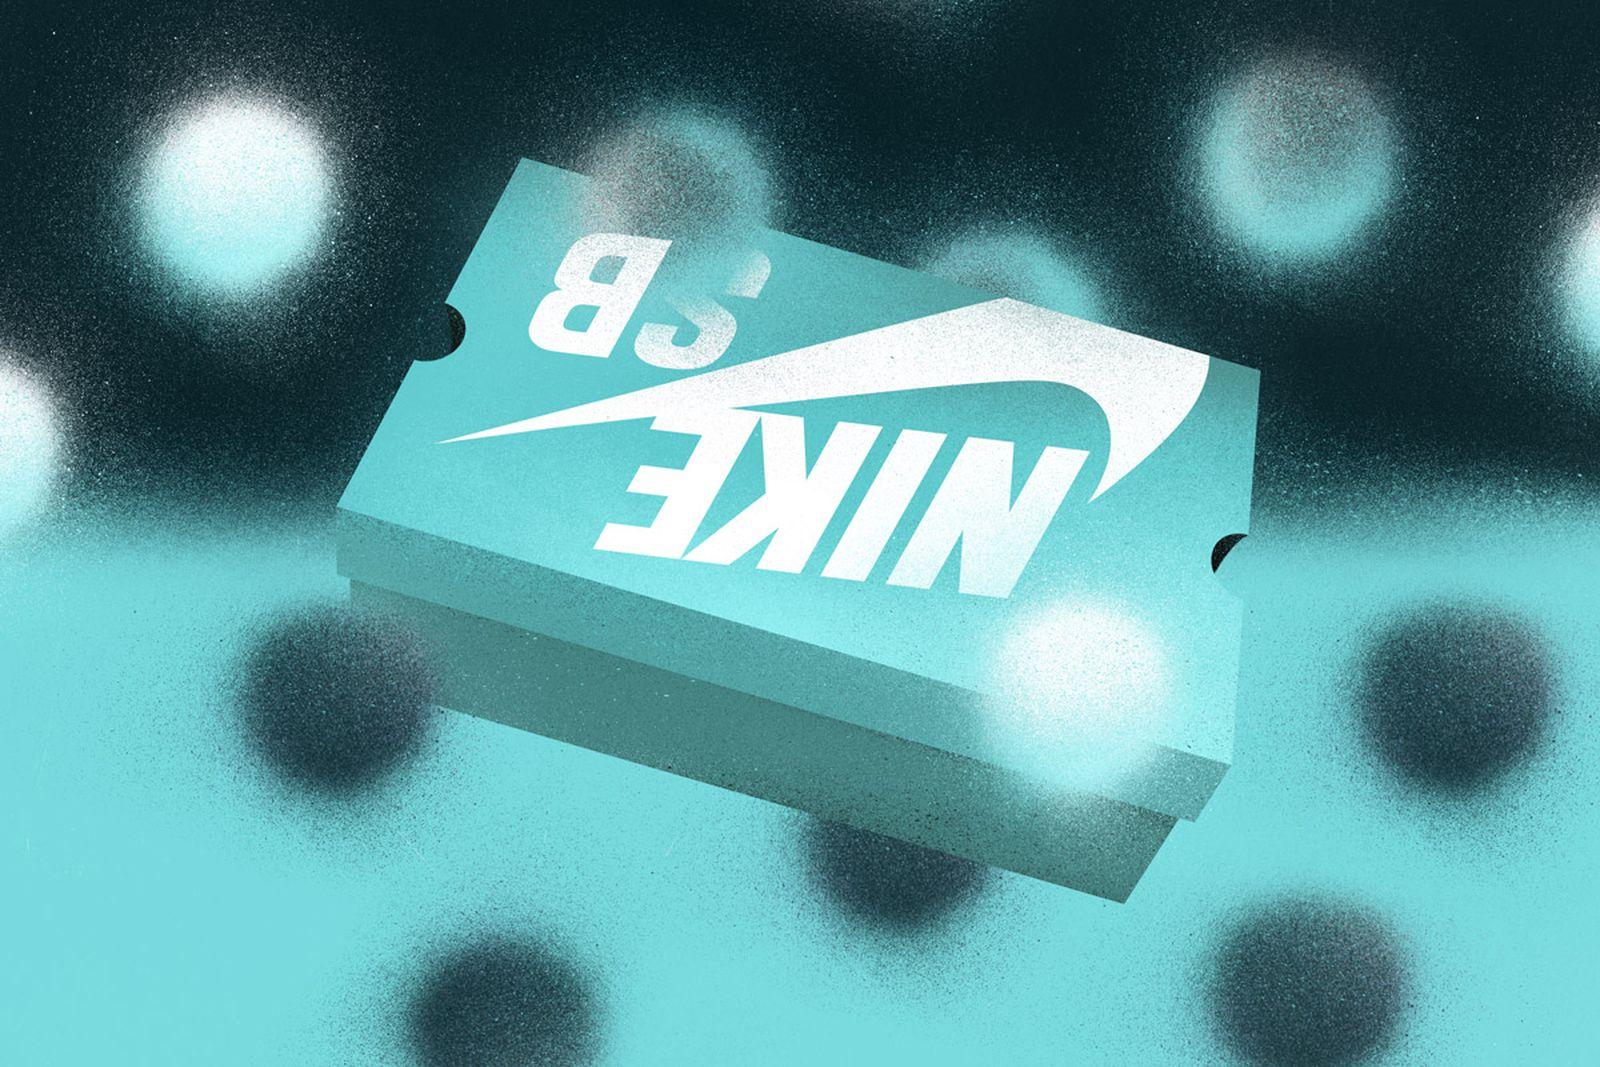 nike sb shoe boxes explained sandy bodecker